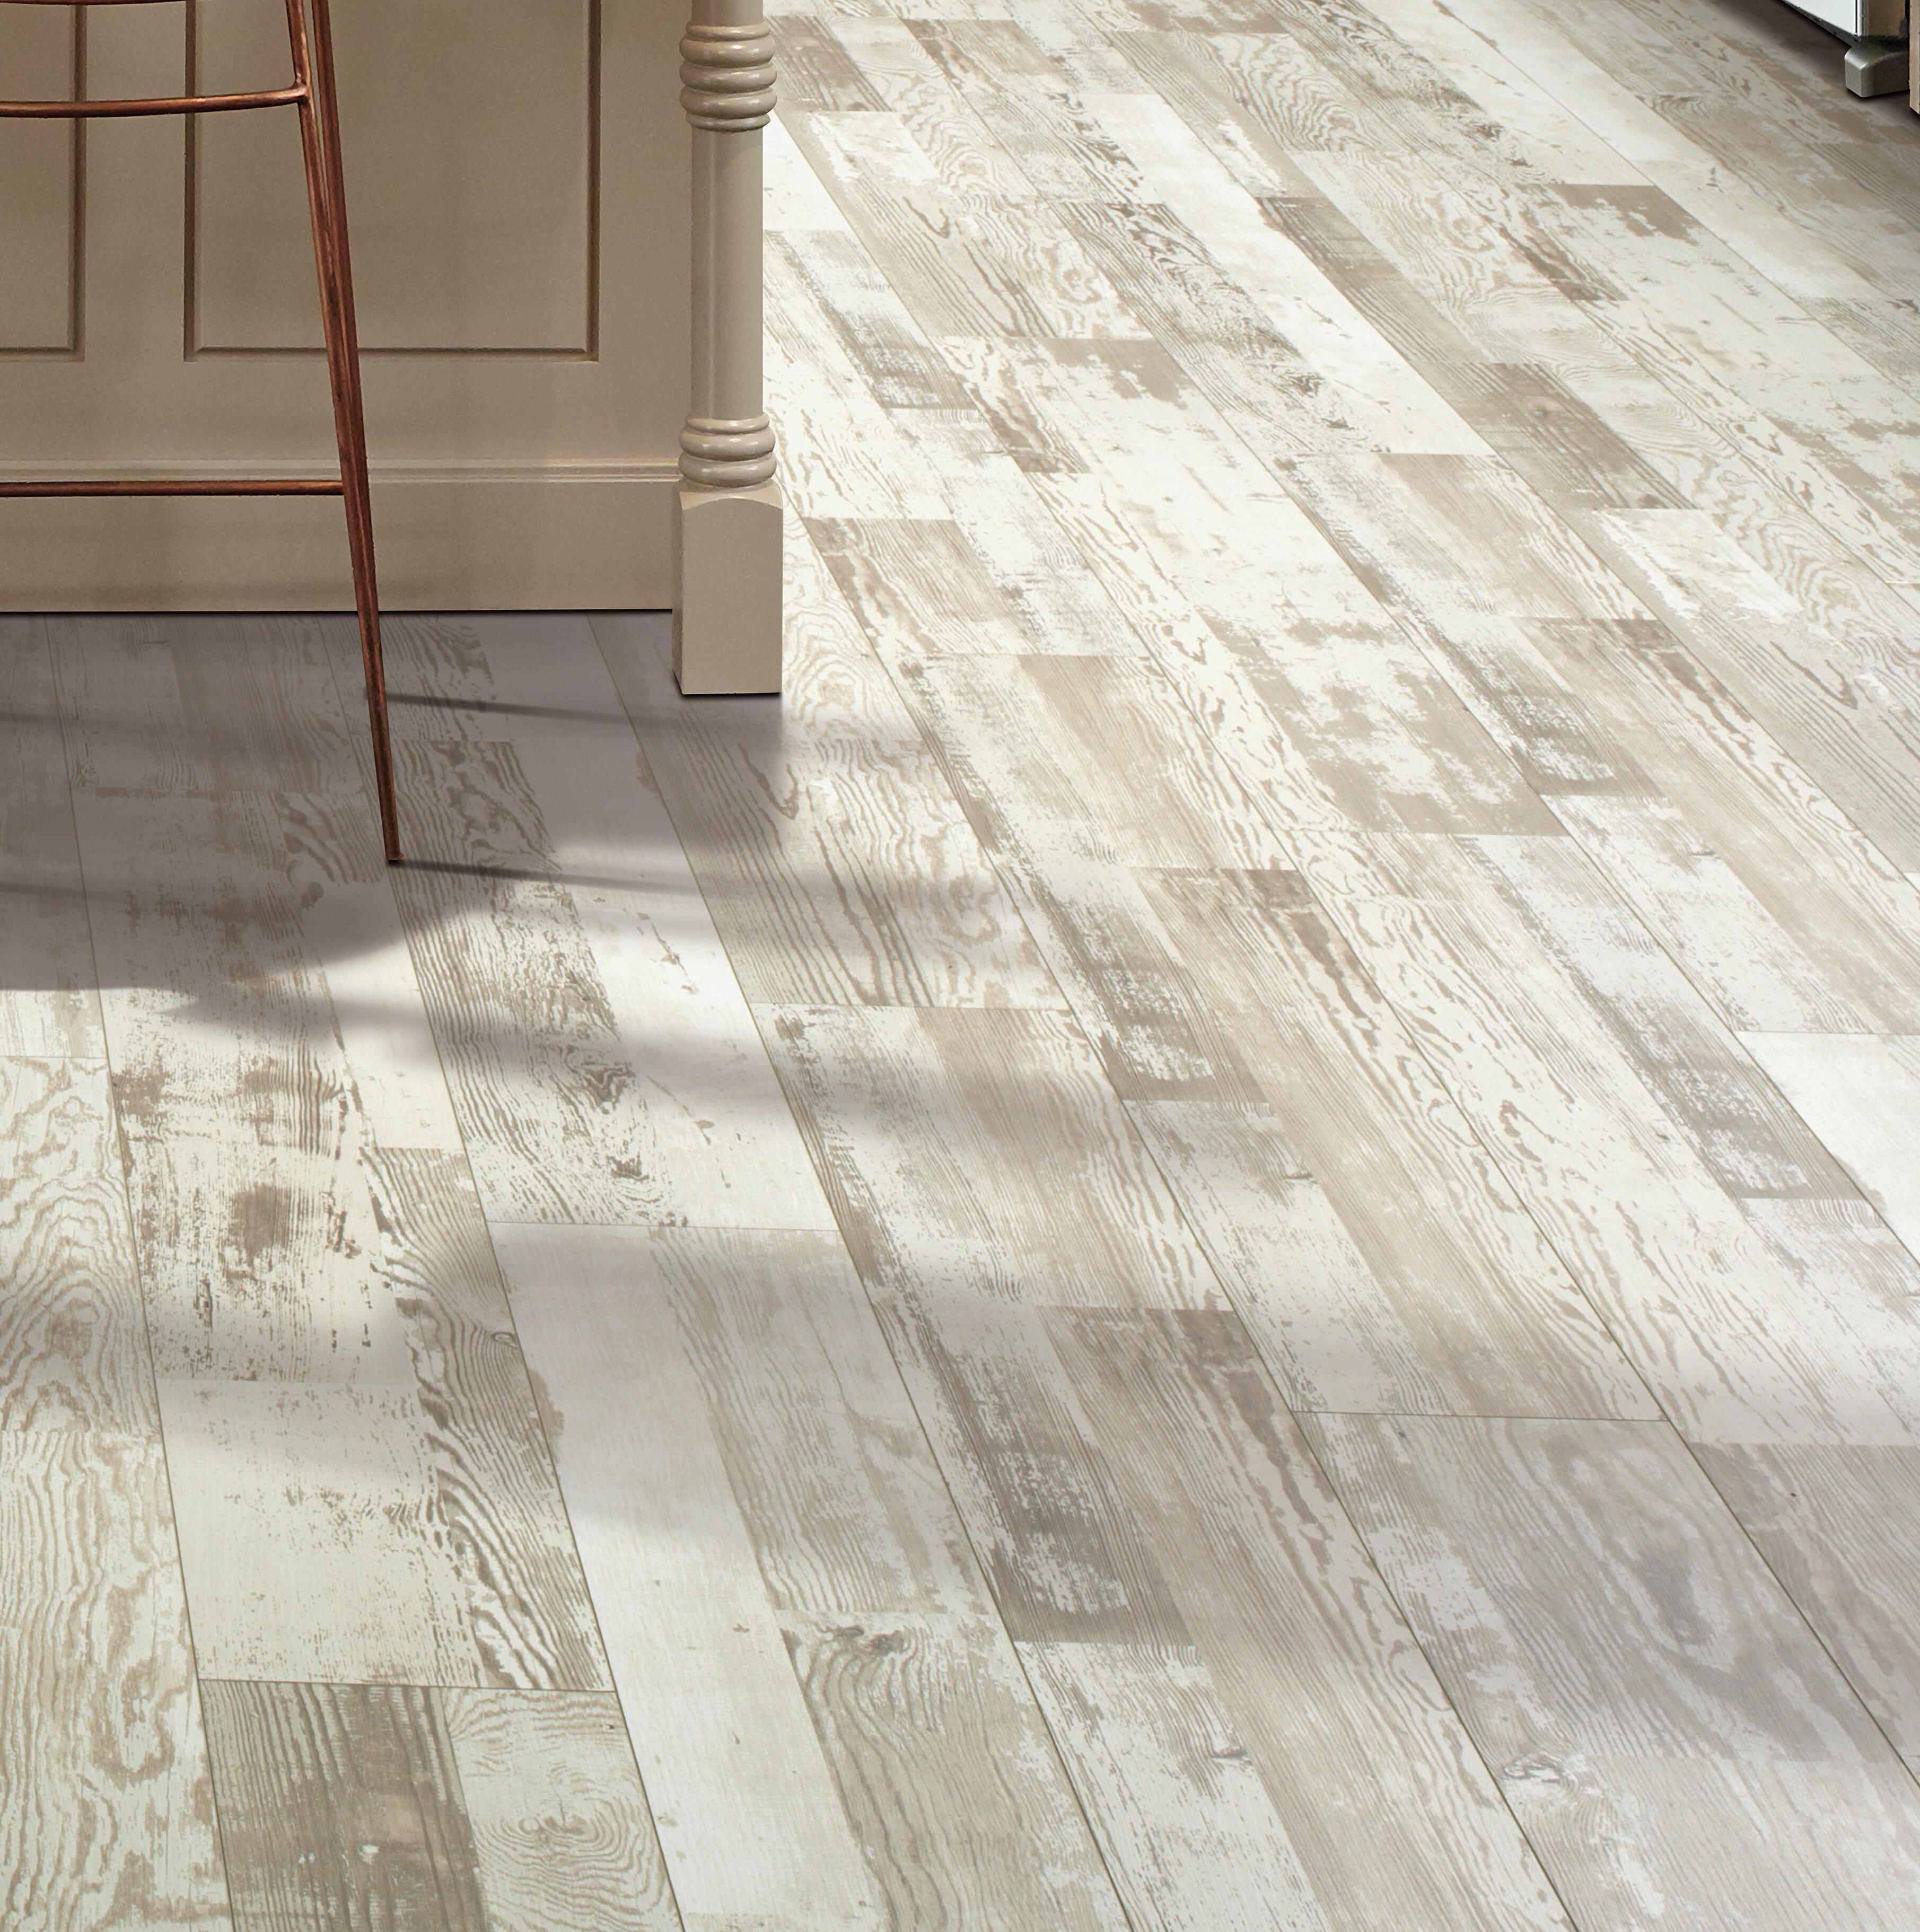 Mohawk Cashe Hills 75 X 4725 X 787mm Pine Laminate Flooring In